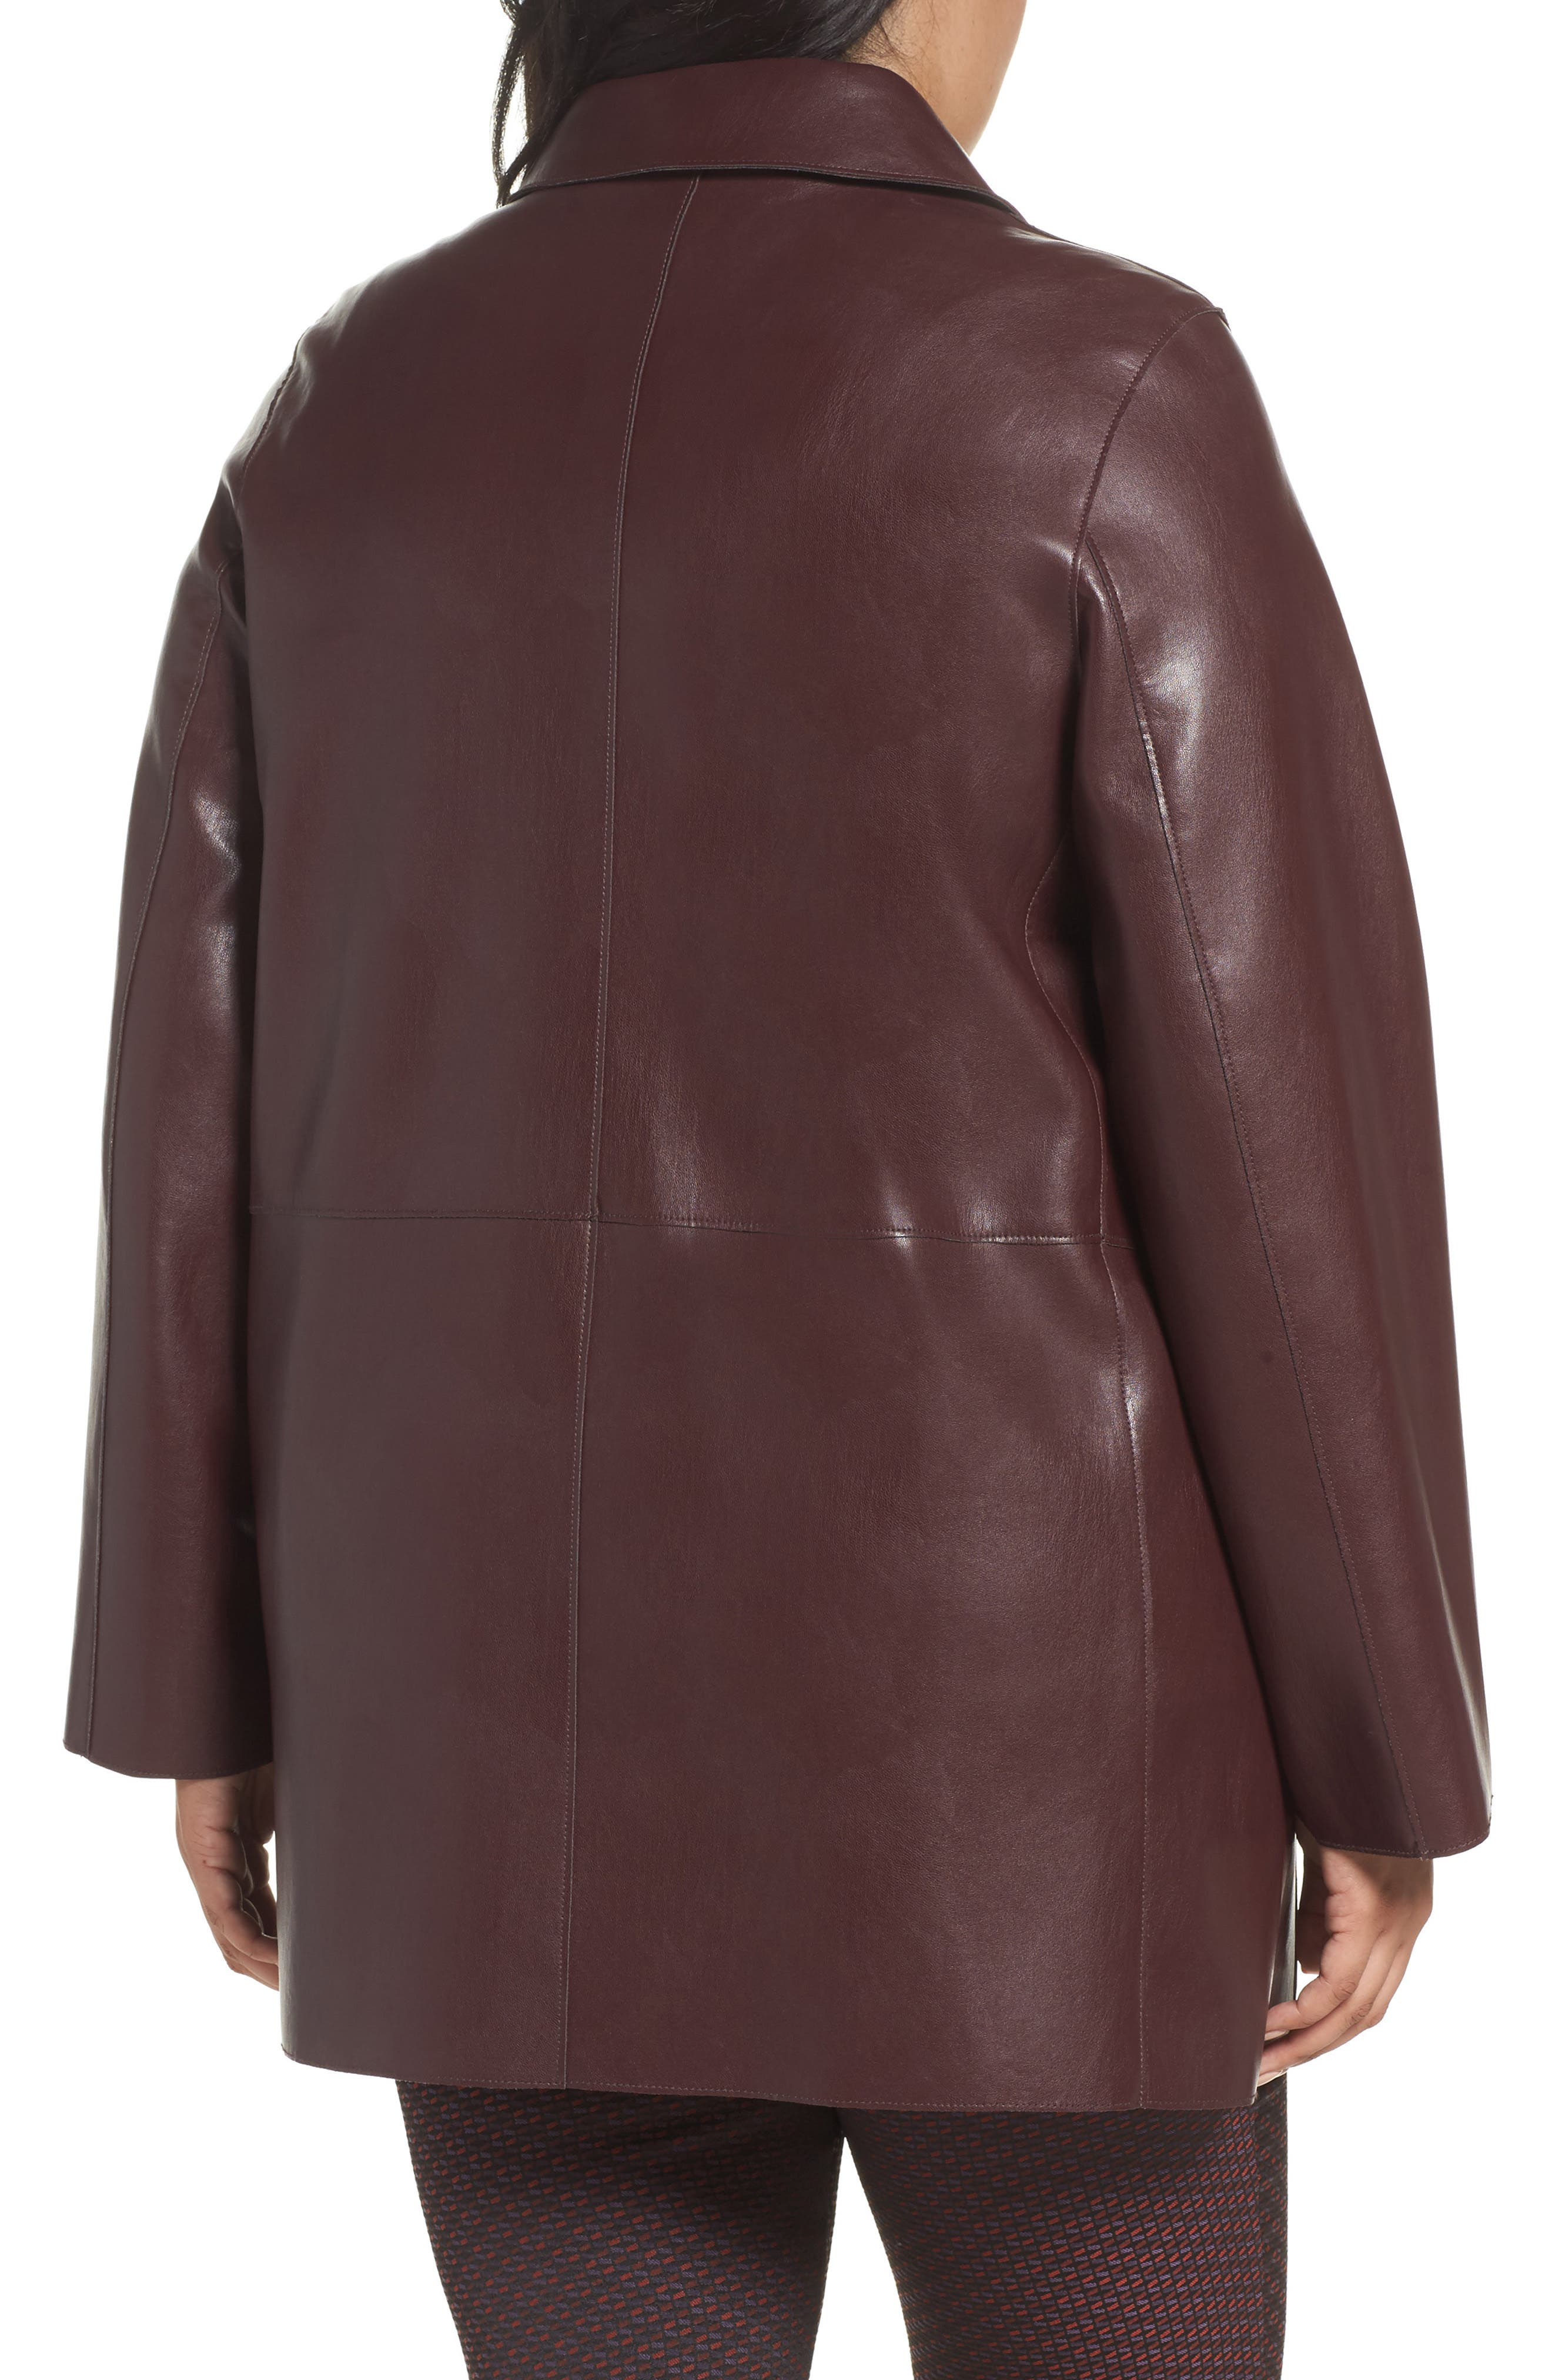 Alternate Image 2  - Persona by Marina Rinaldi Narrare Faux Leather Coat (Plus Size)